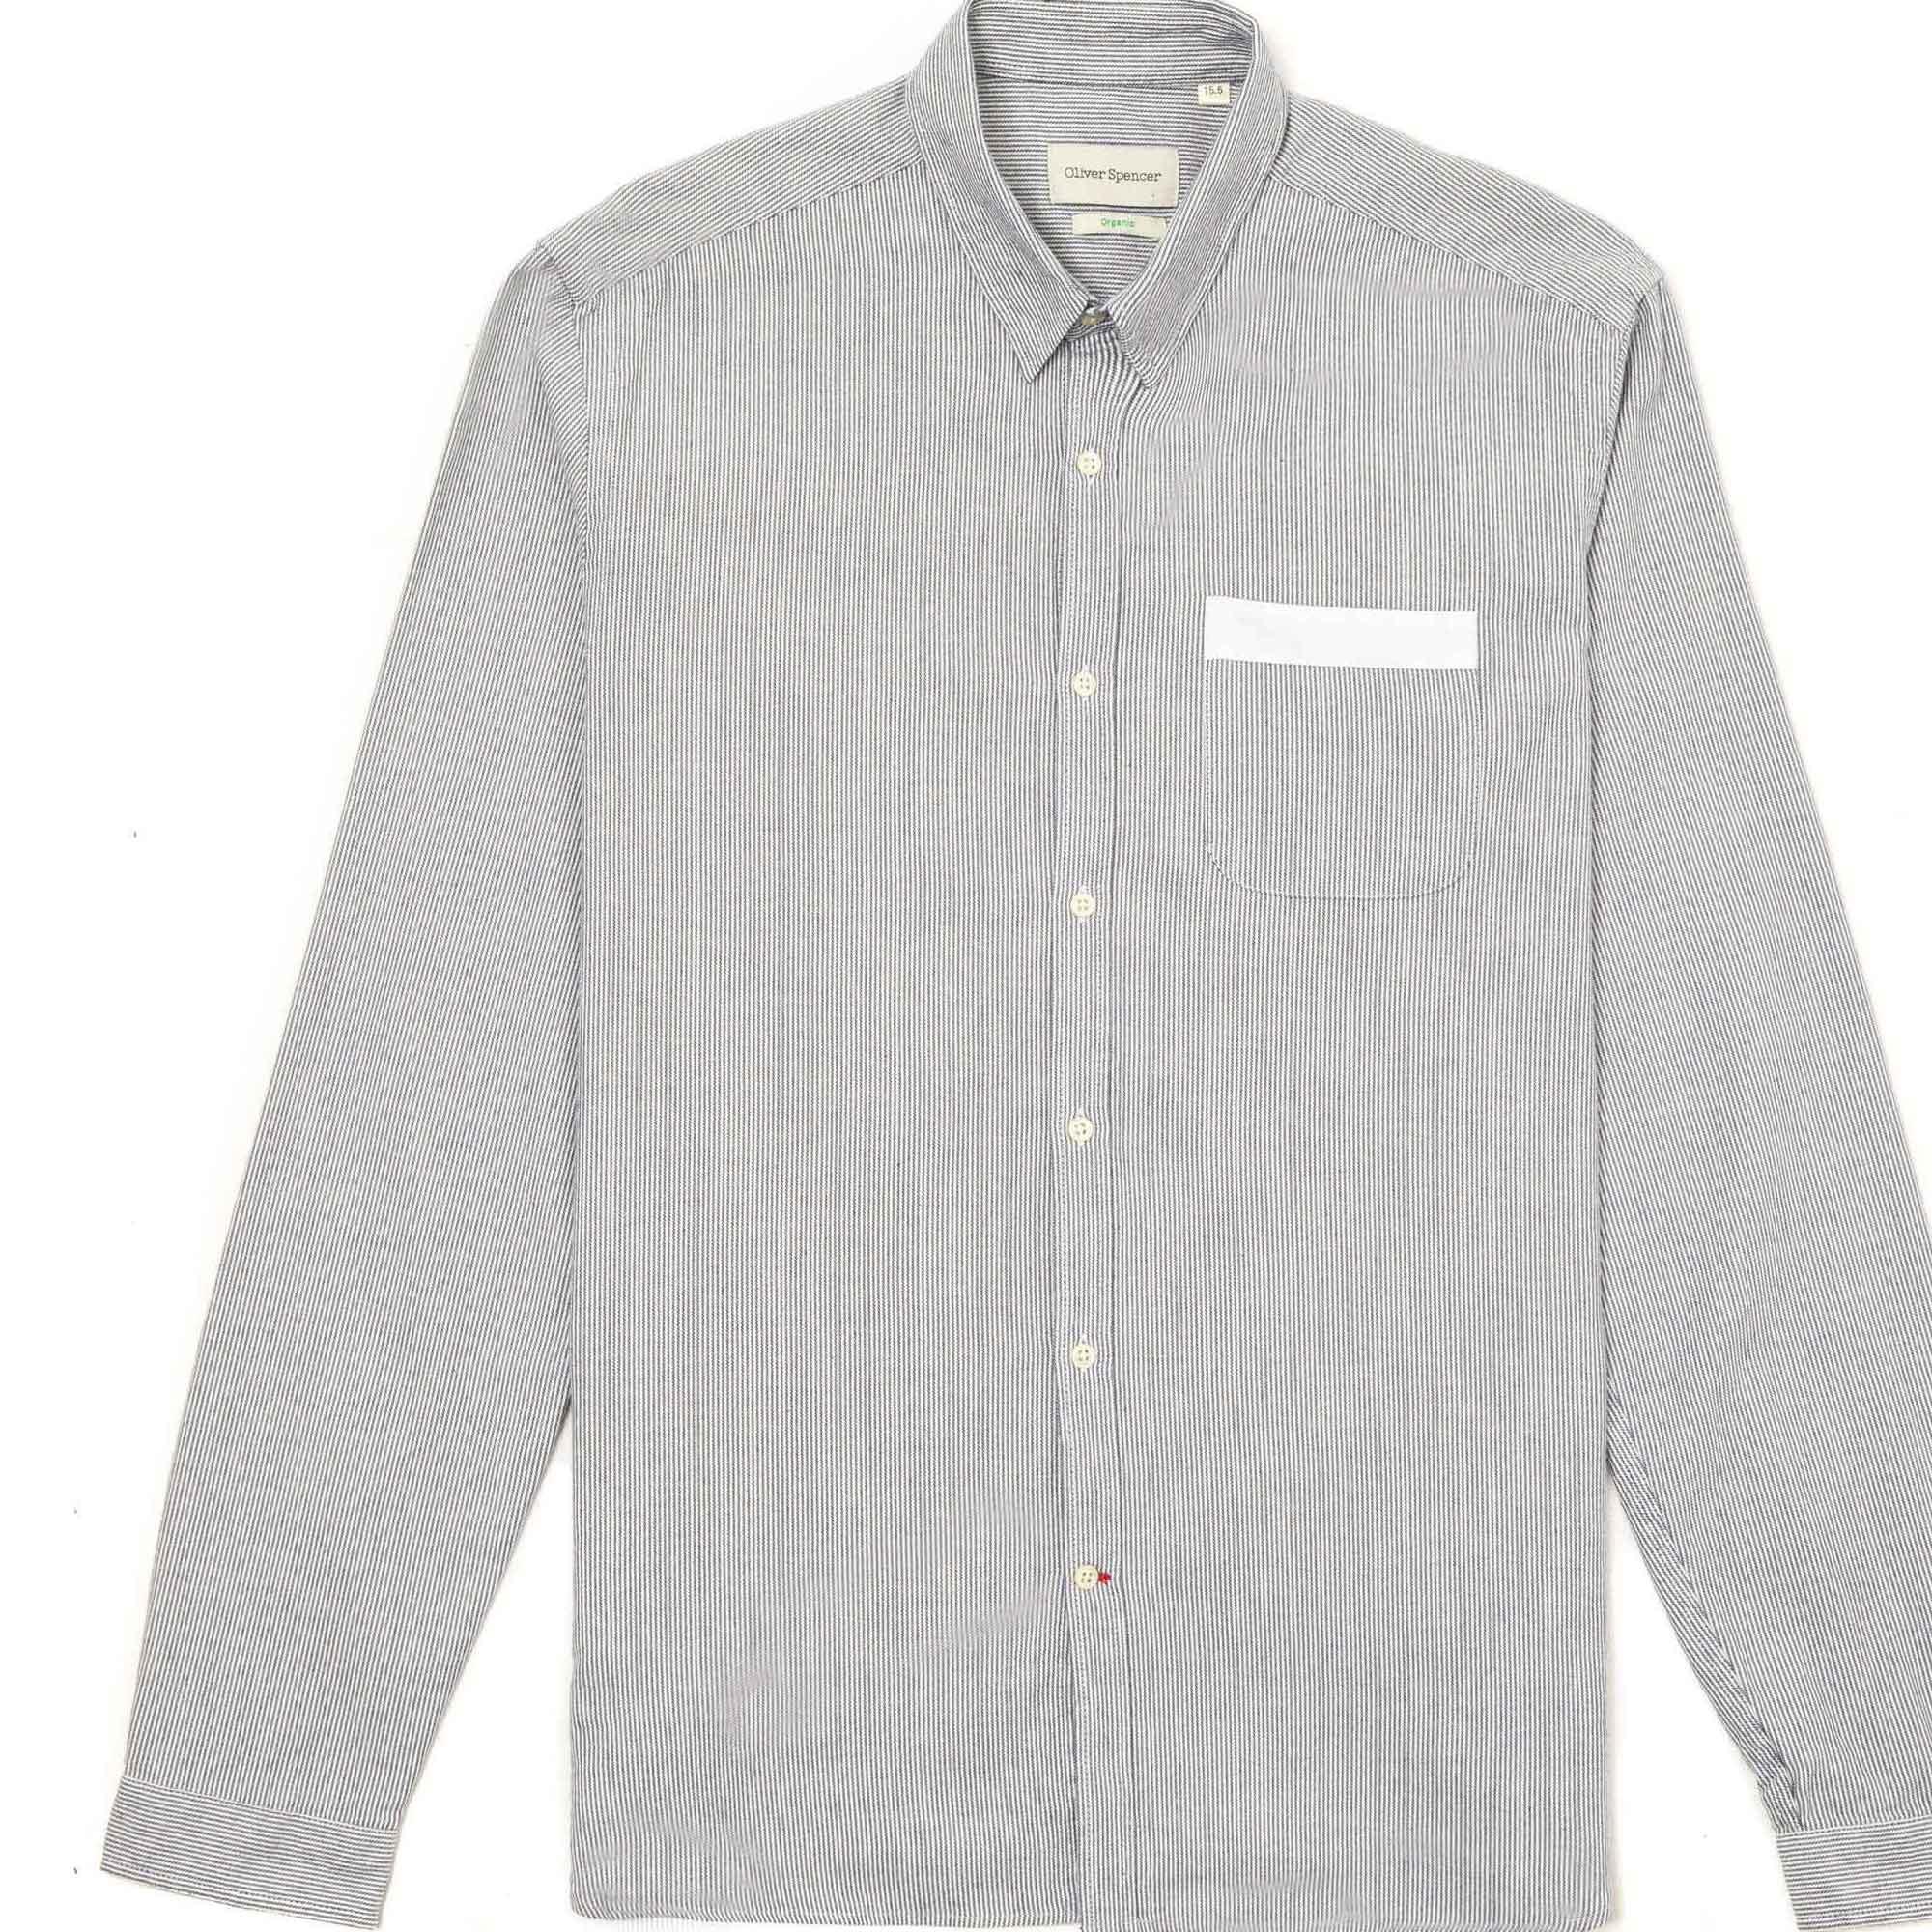 Camisa azul marino franja blanca en la bolsa